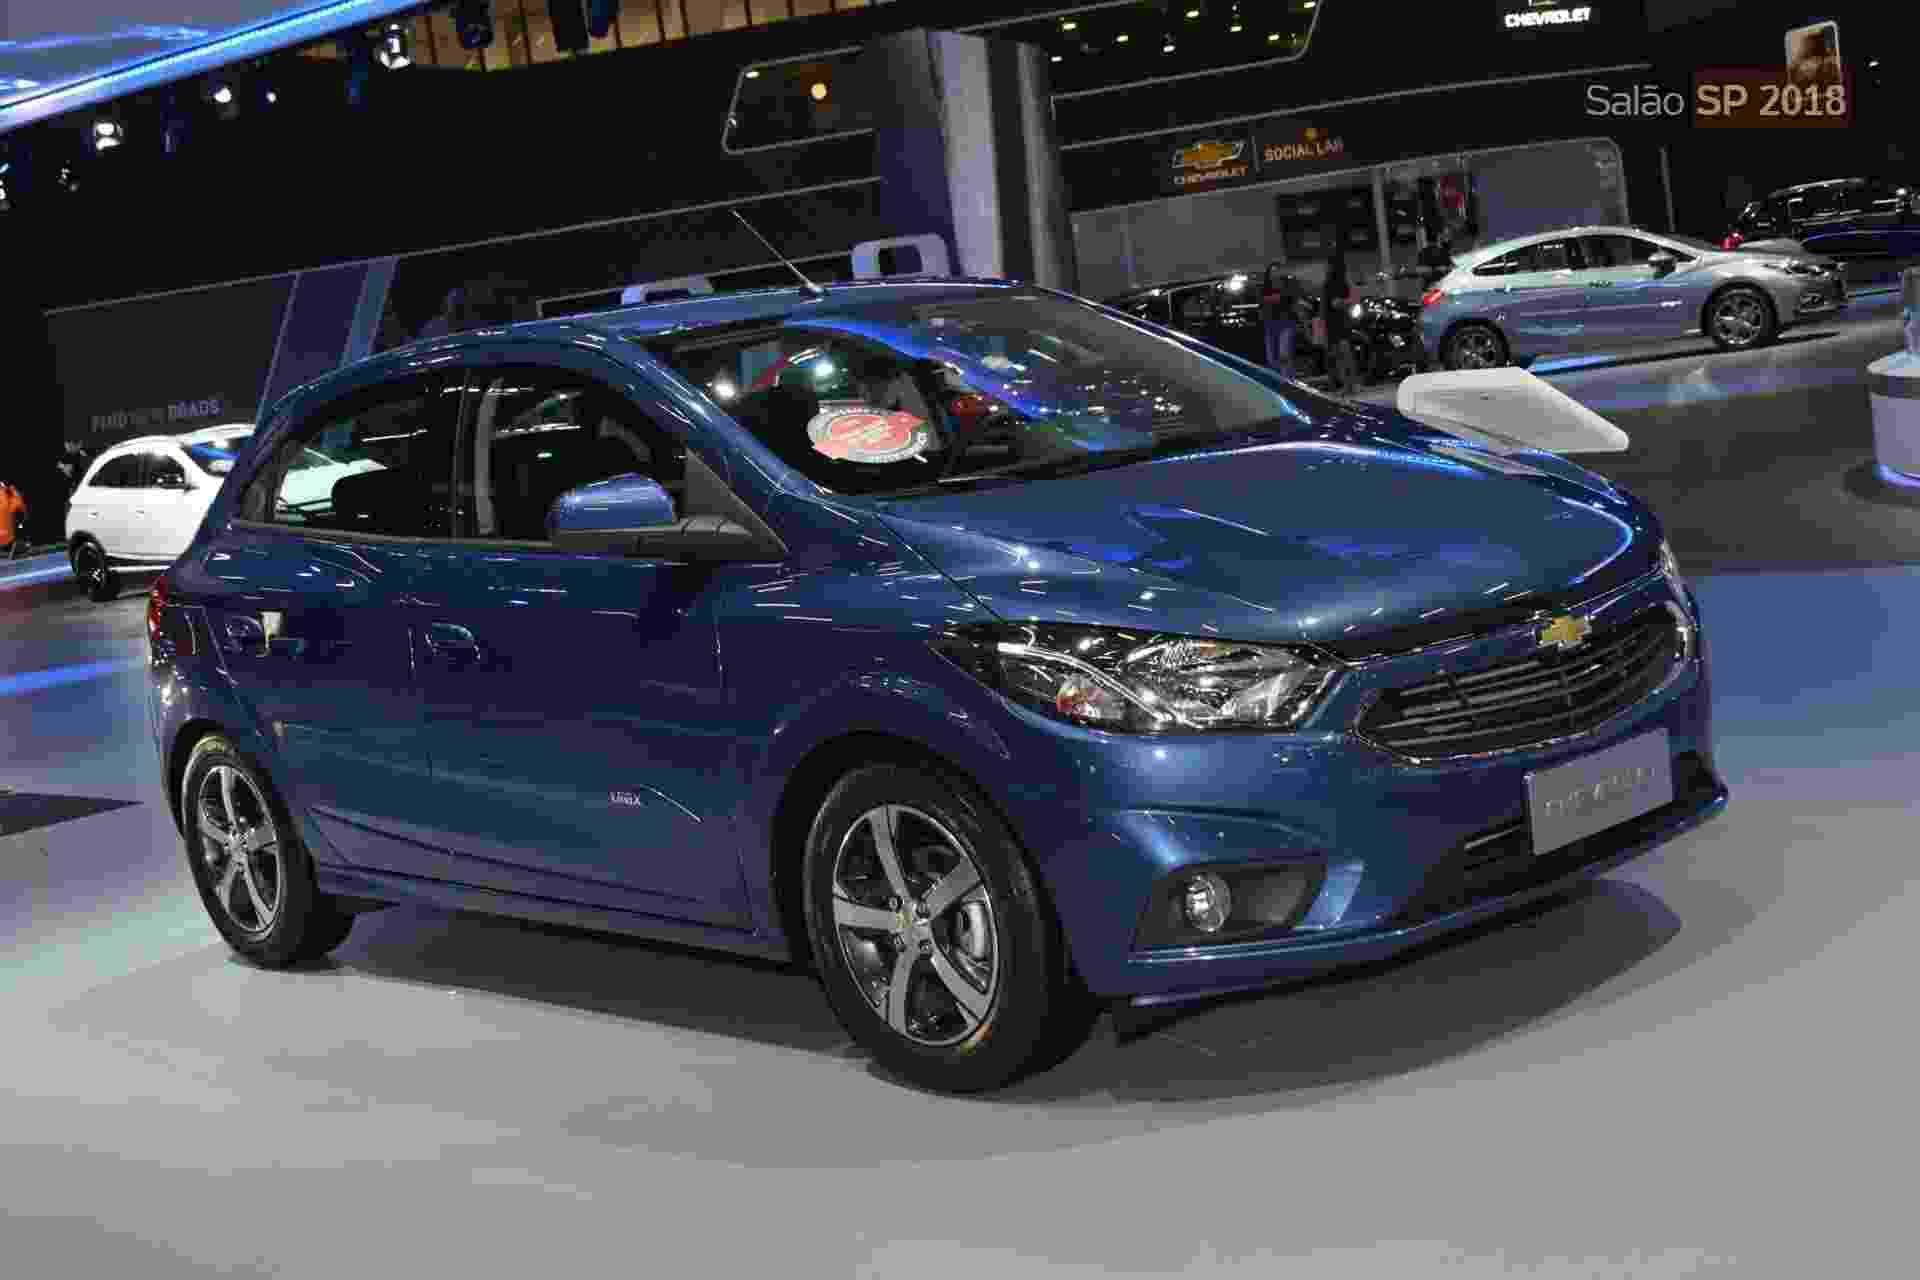 Chevrolet Onix LTX - Murilo Góes/UOL